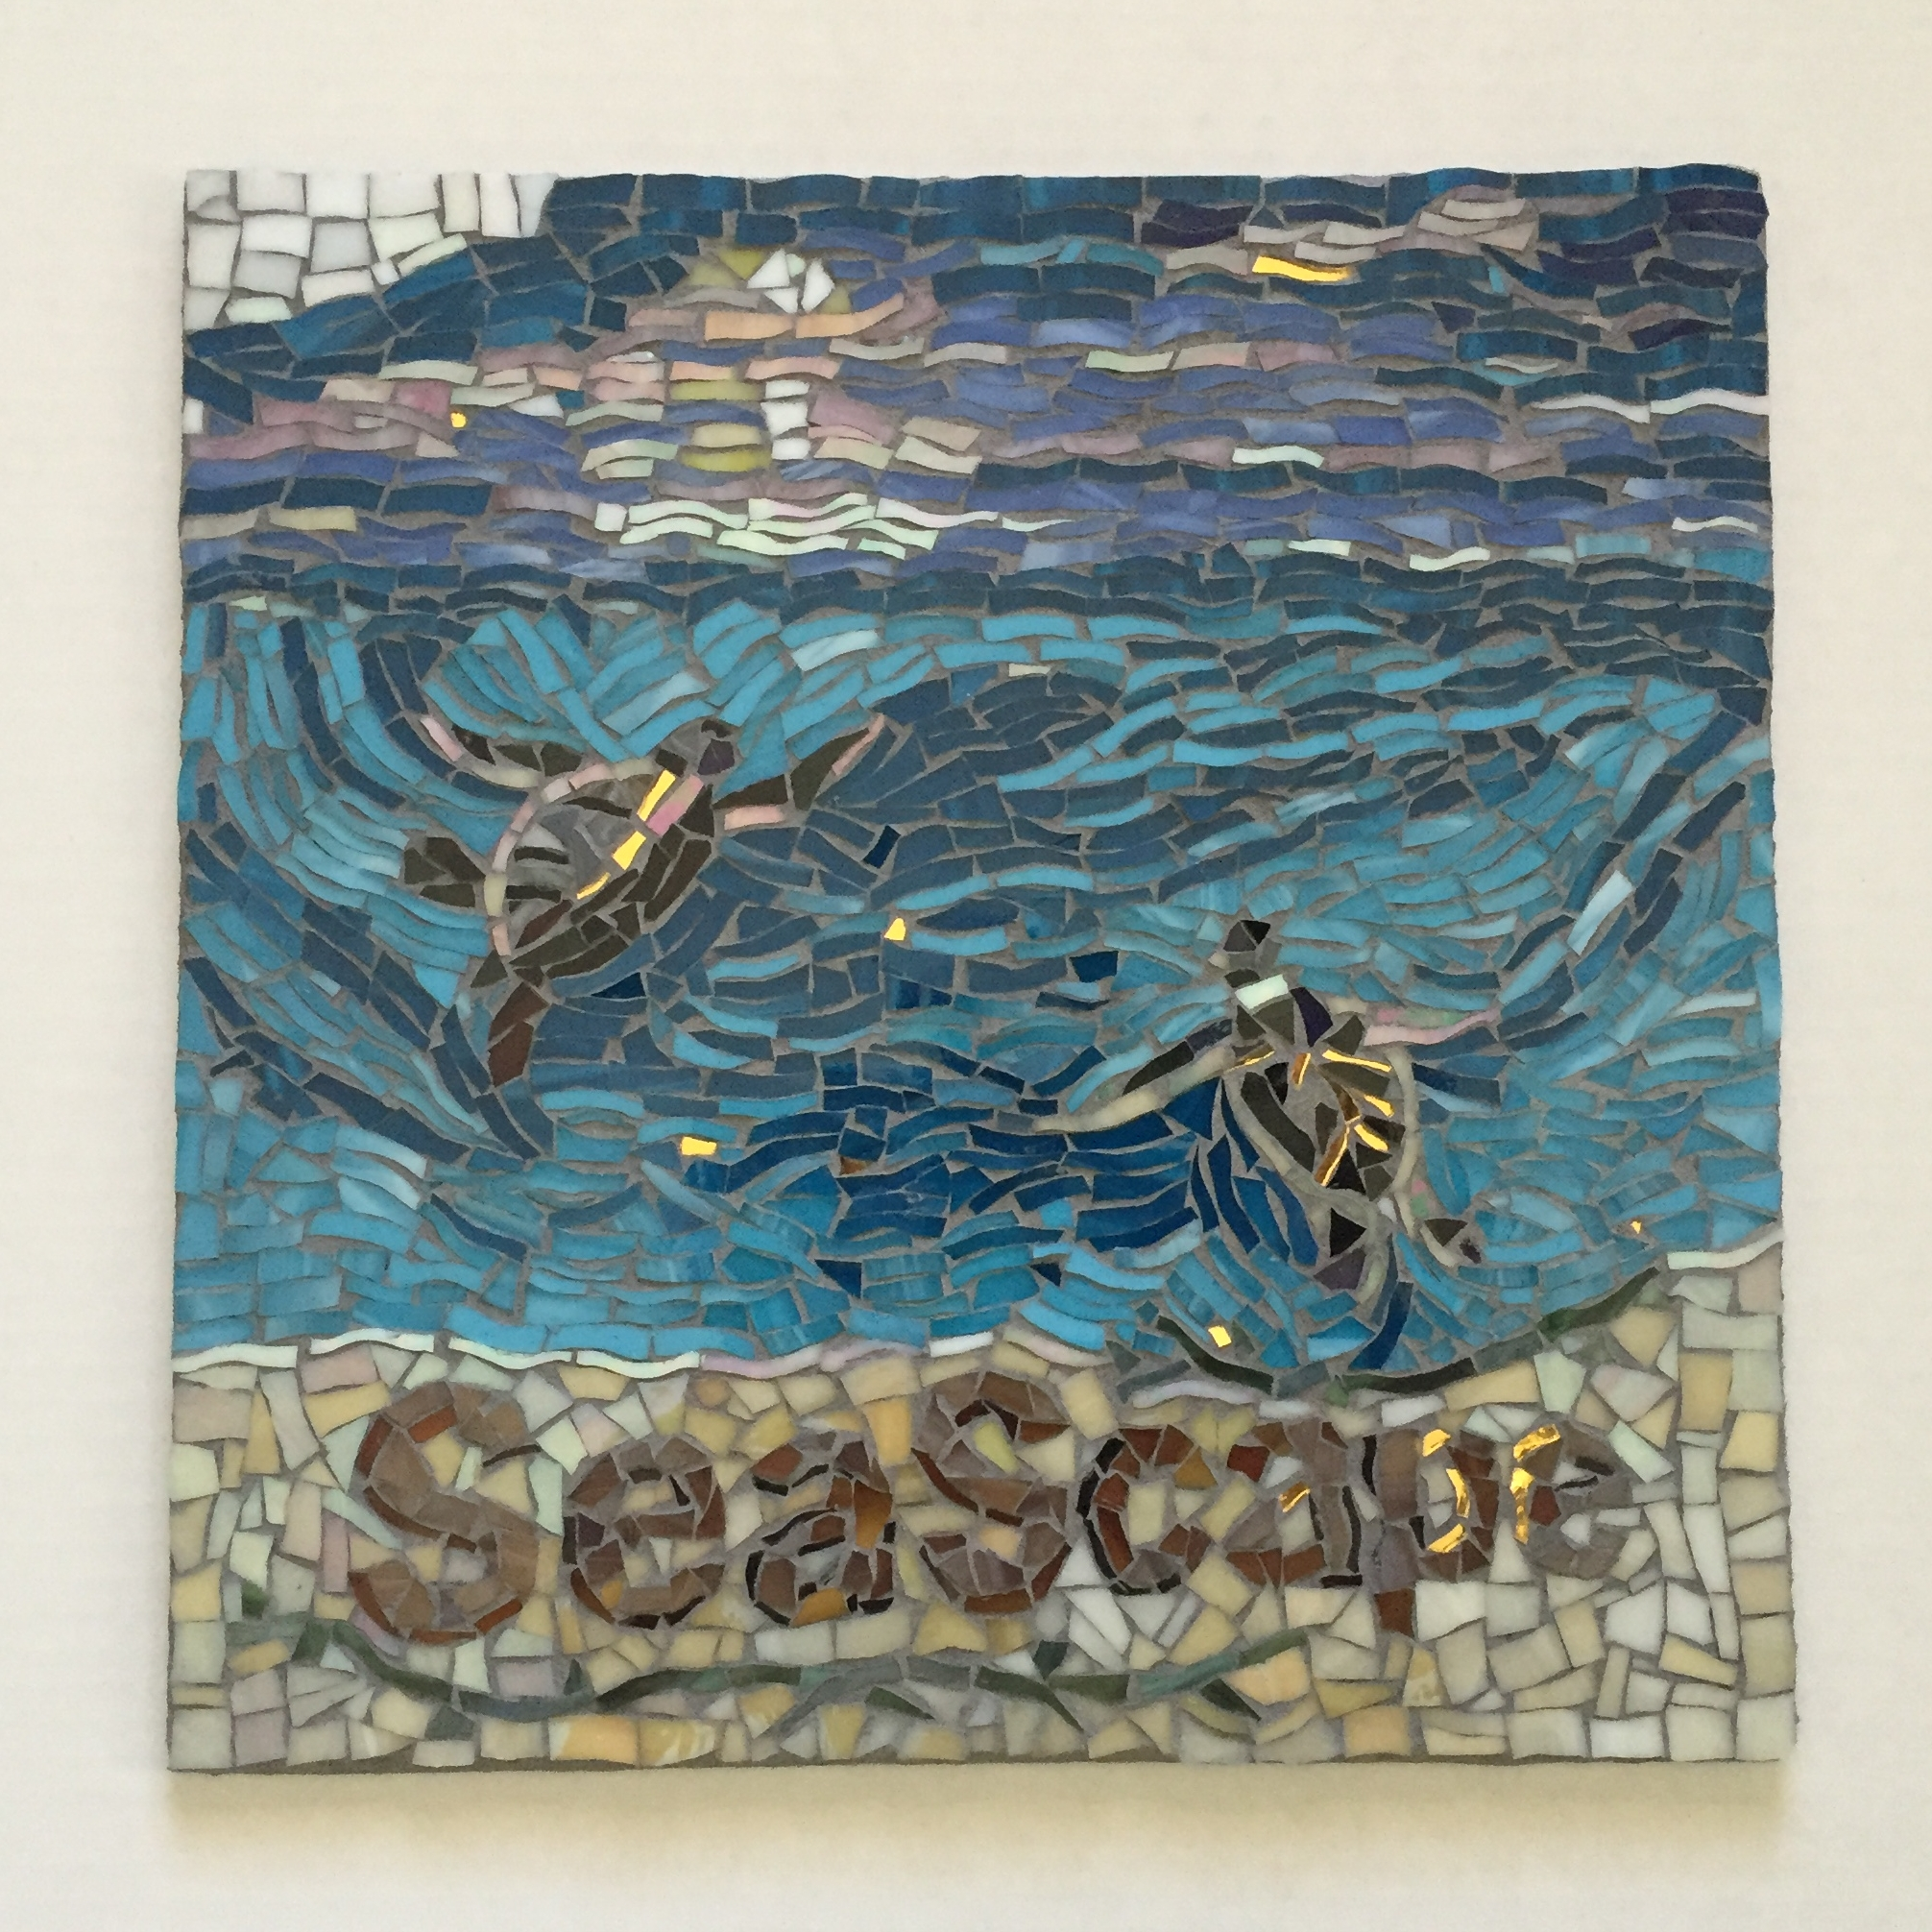 SEASCAPE TURTLE SHOWER MOSAIC